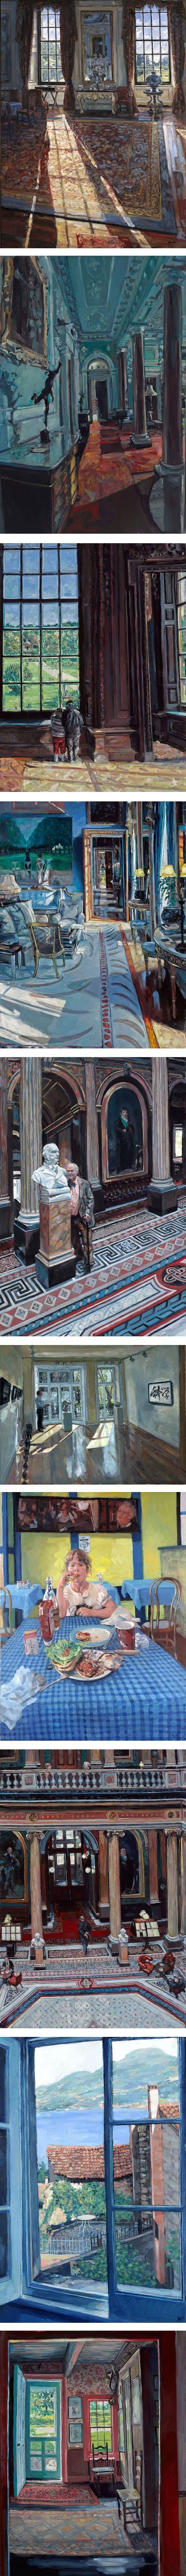 Hector McDonnell, Irish realist painter, room interiors